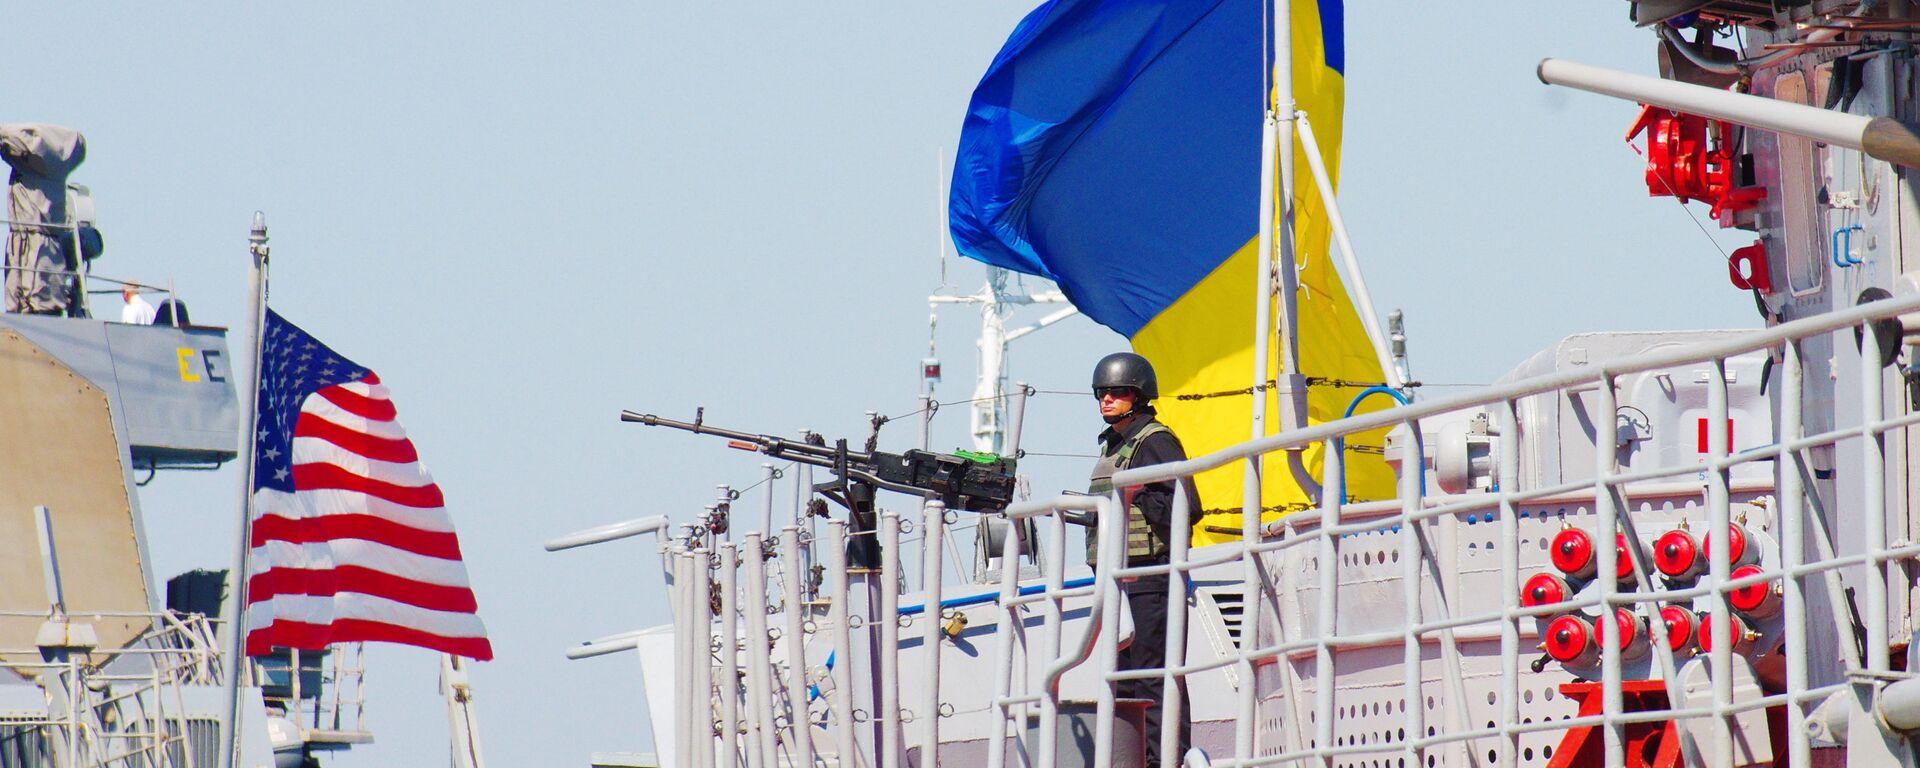 "Amerykańsko-ukraińskie manewry morskie ""Sea Breeze - 2015""  - Sputnik Polska, 1920, 26.06.2021"